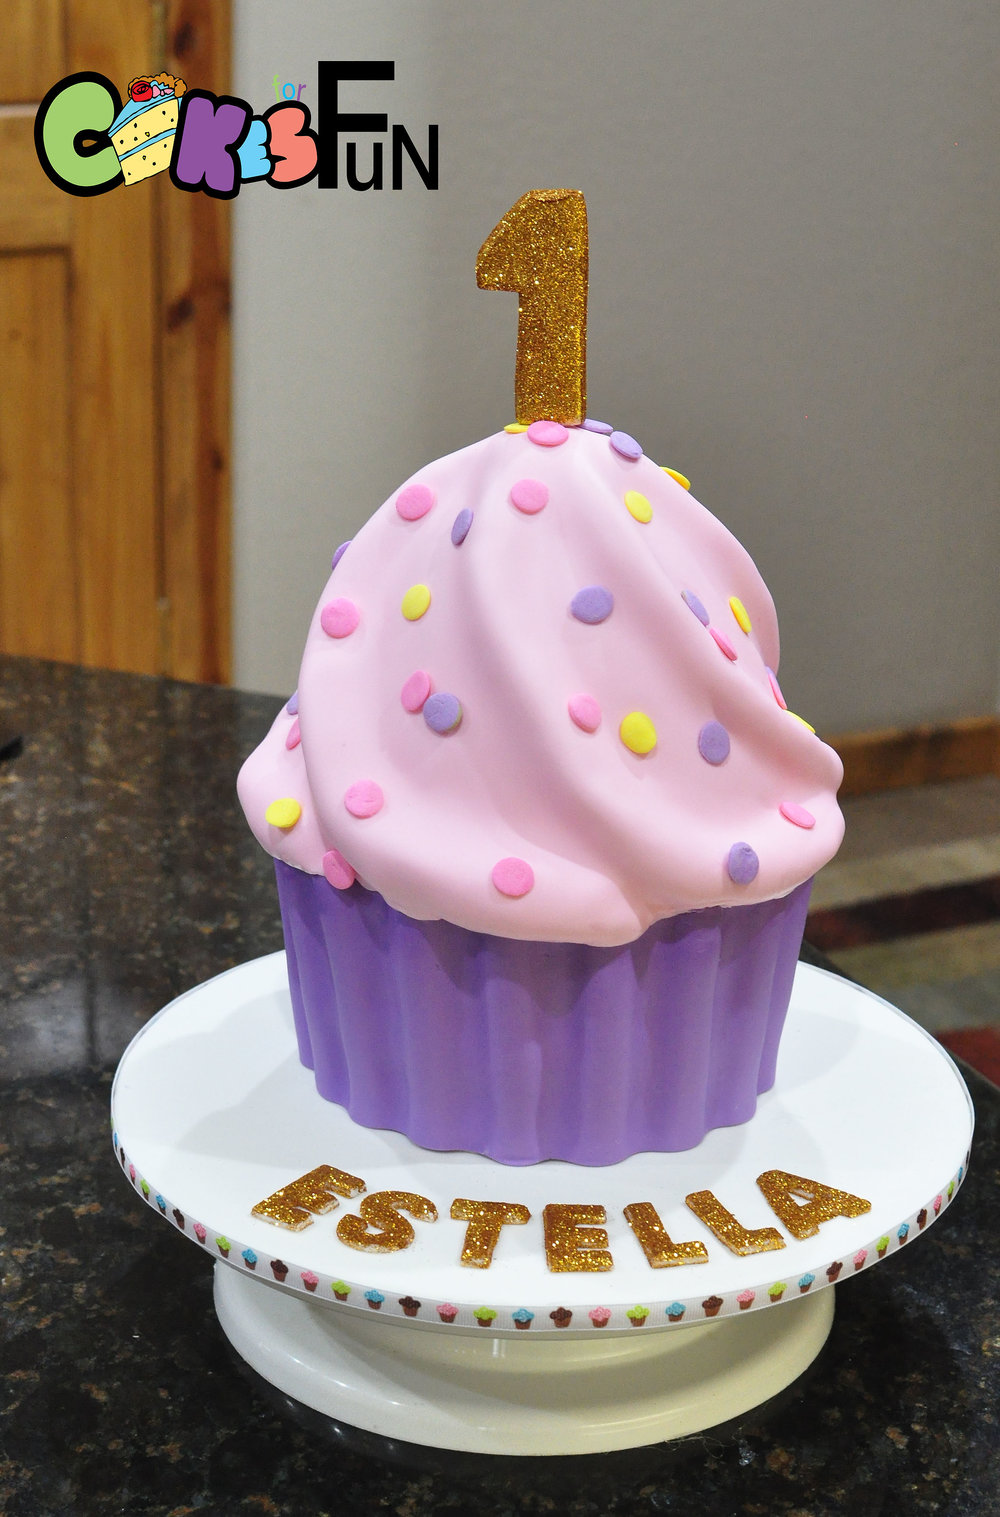 giant cupcake 030818.jpg